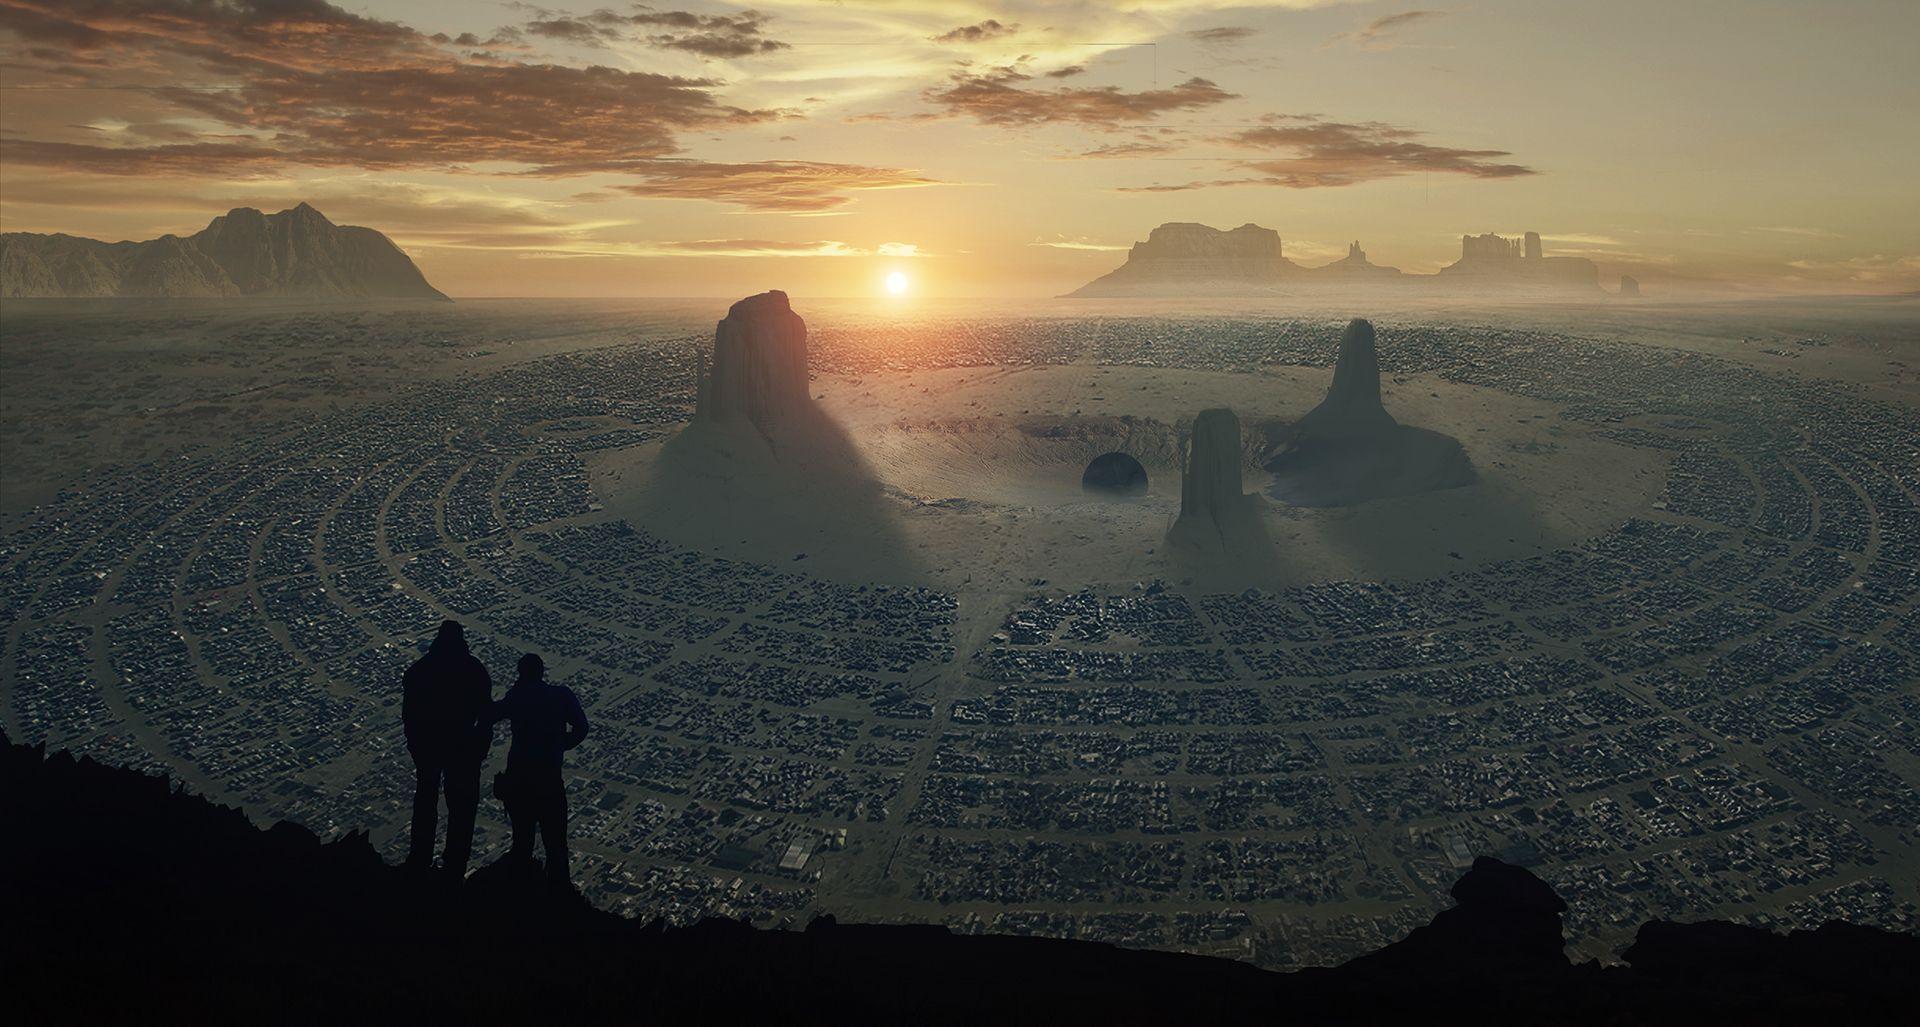 Desert discover - concept environment by julien hauville